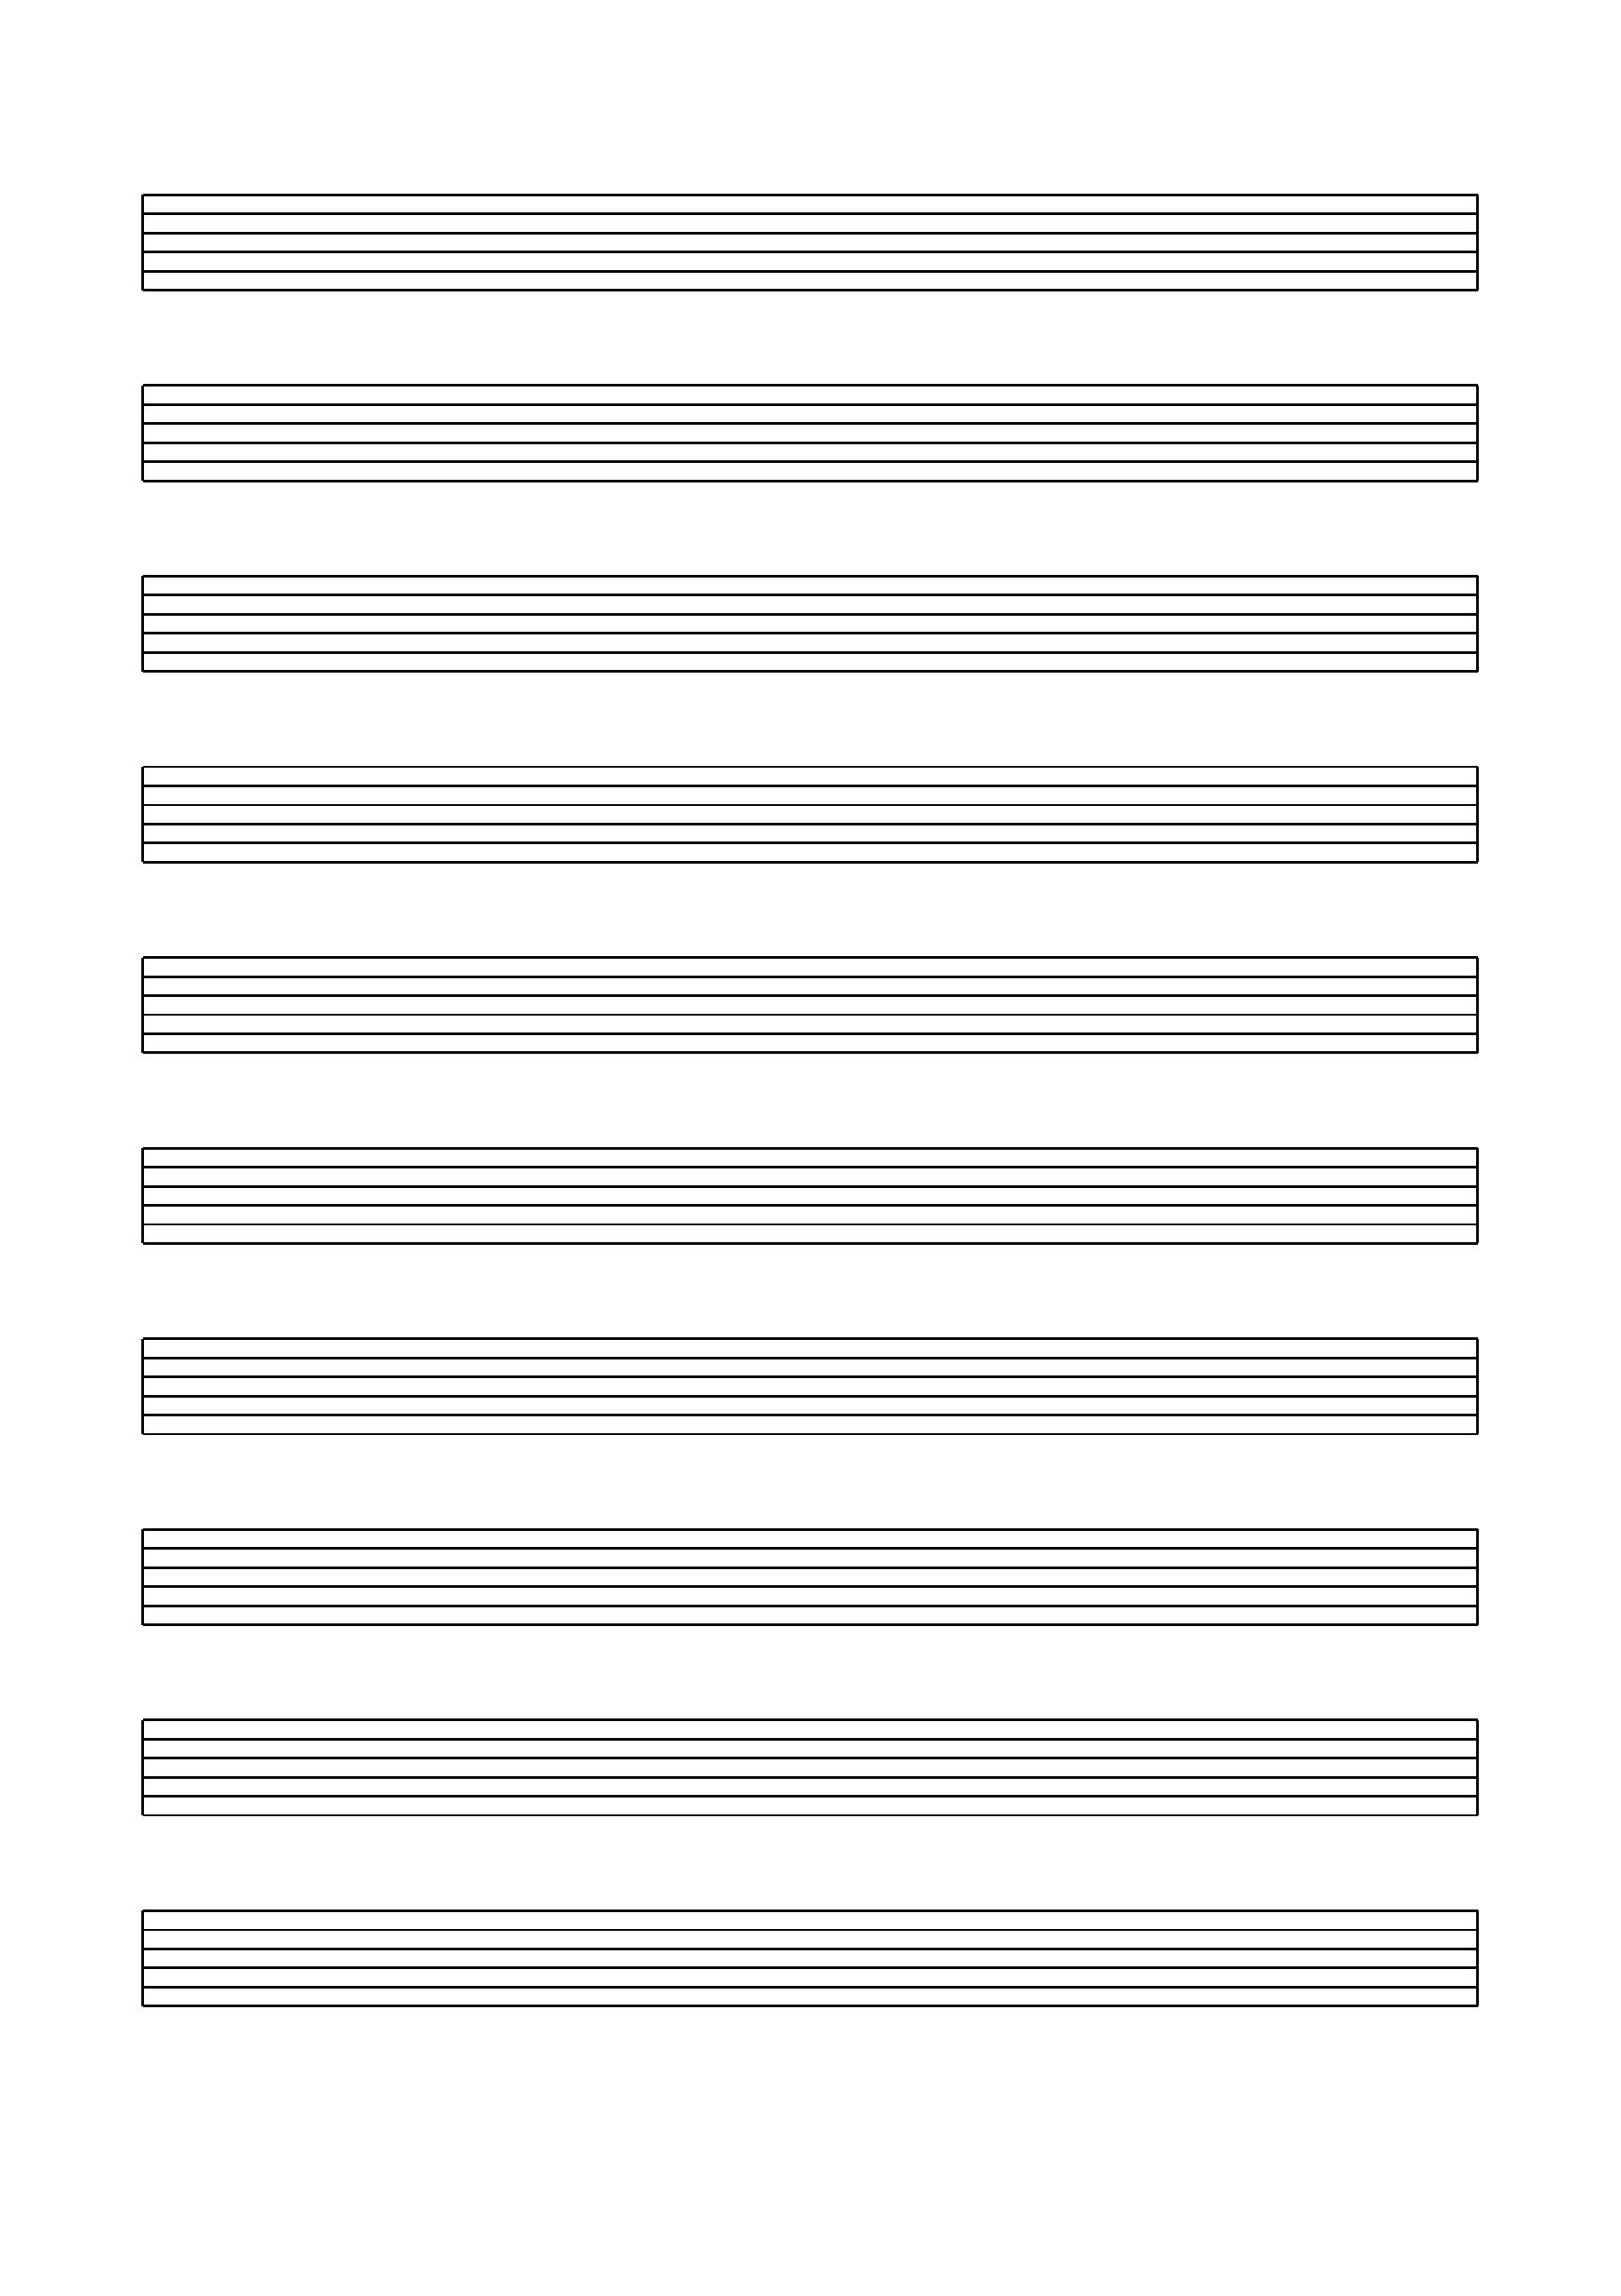 Blank Music Staff Paper Pdf - Free Printable Grand Staff Paper